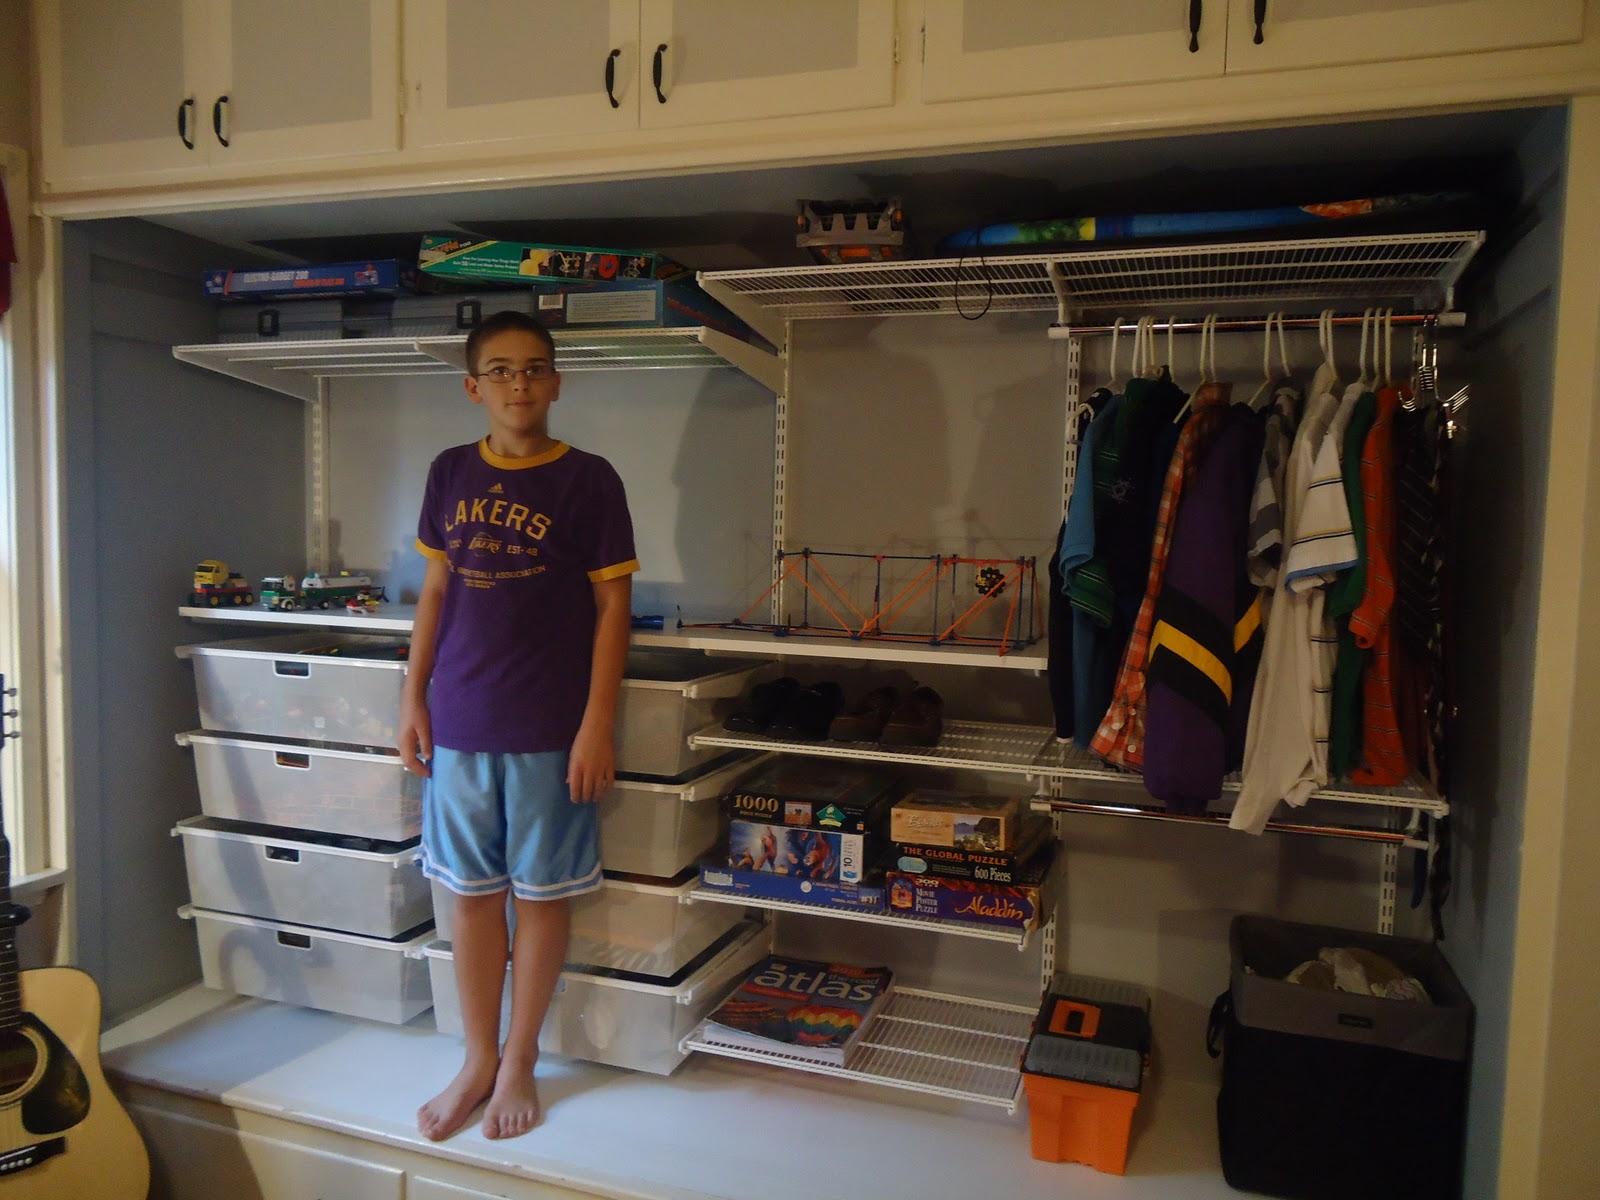 My boy's closet...close up and organized! | Organizing ...